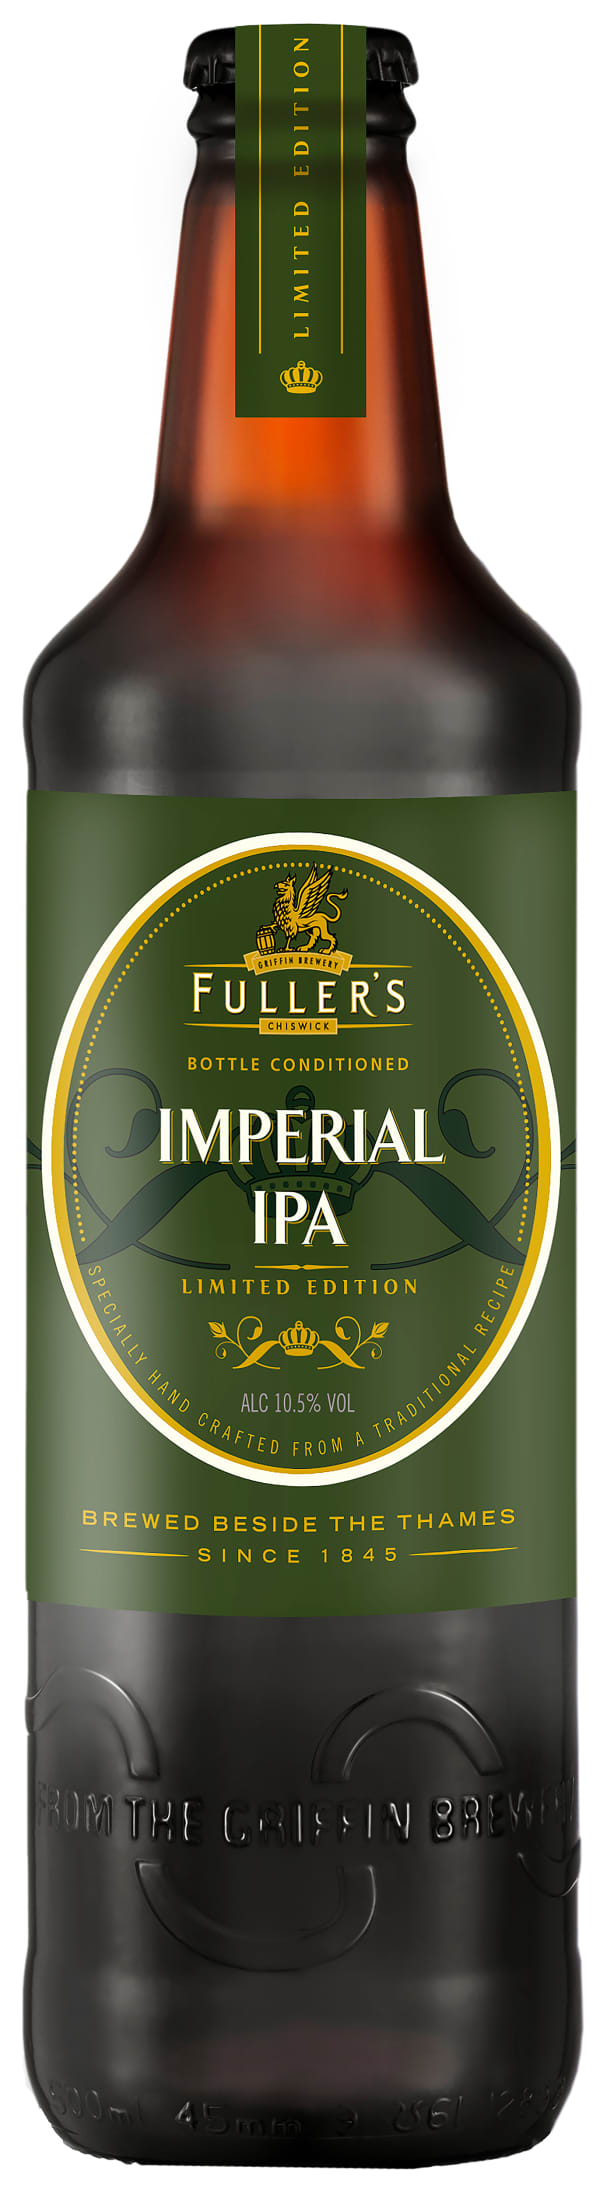 Fuller's Imperial IPA